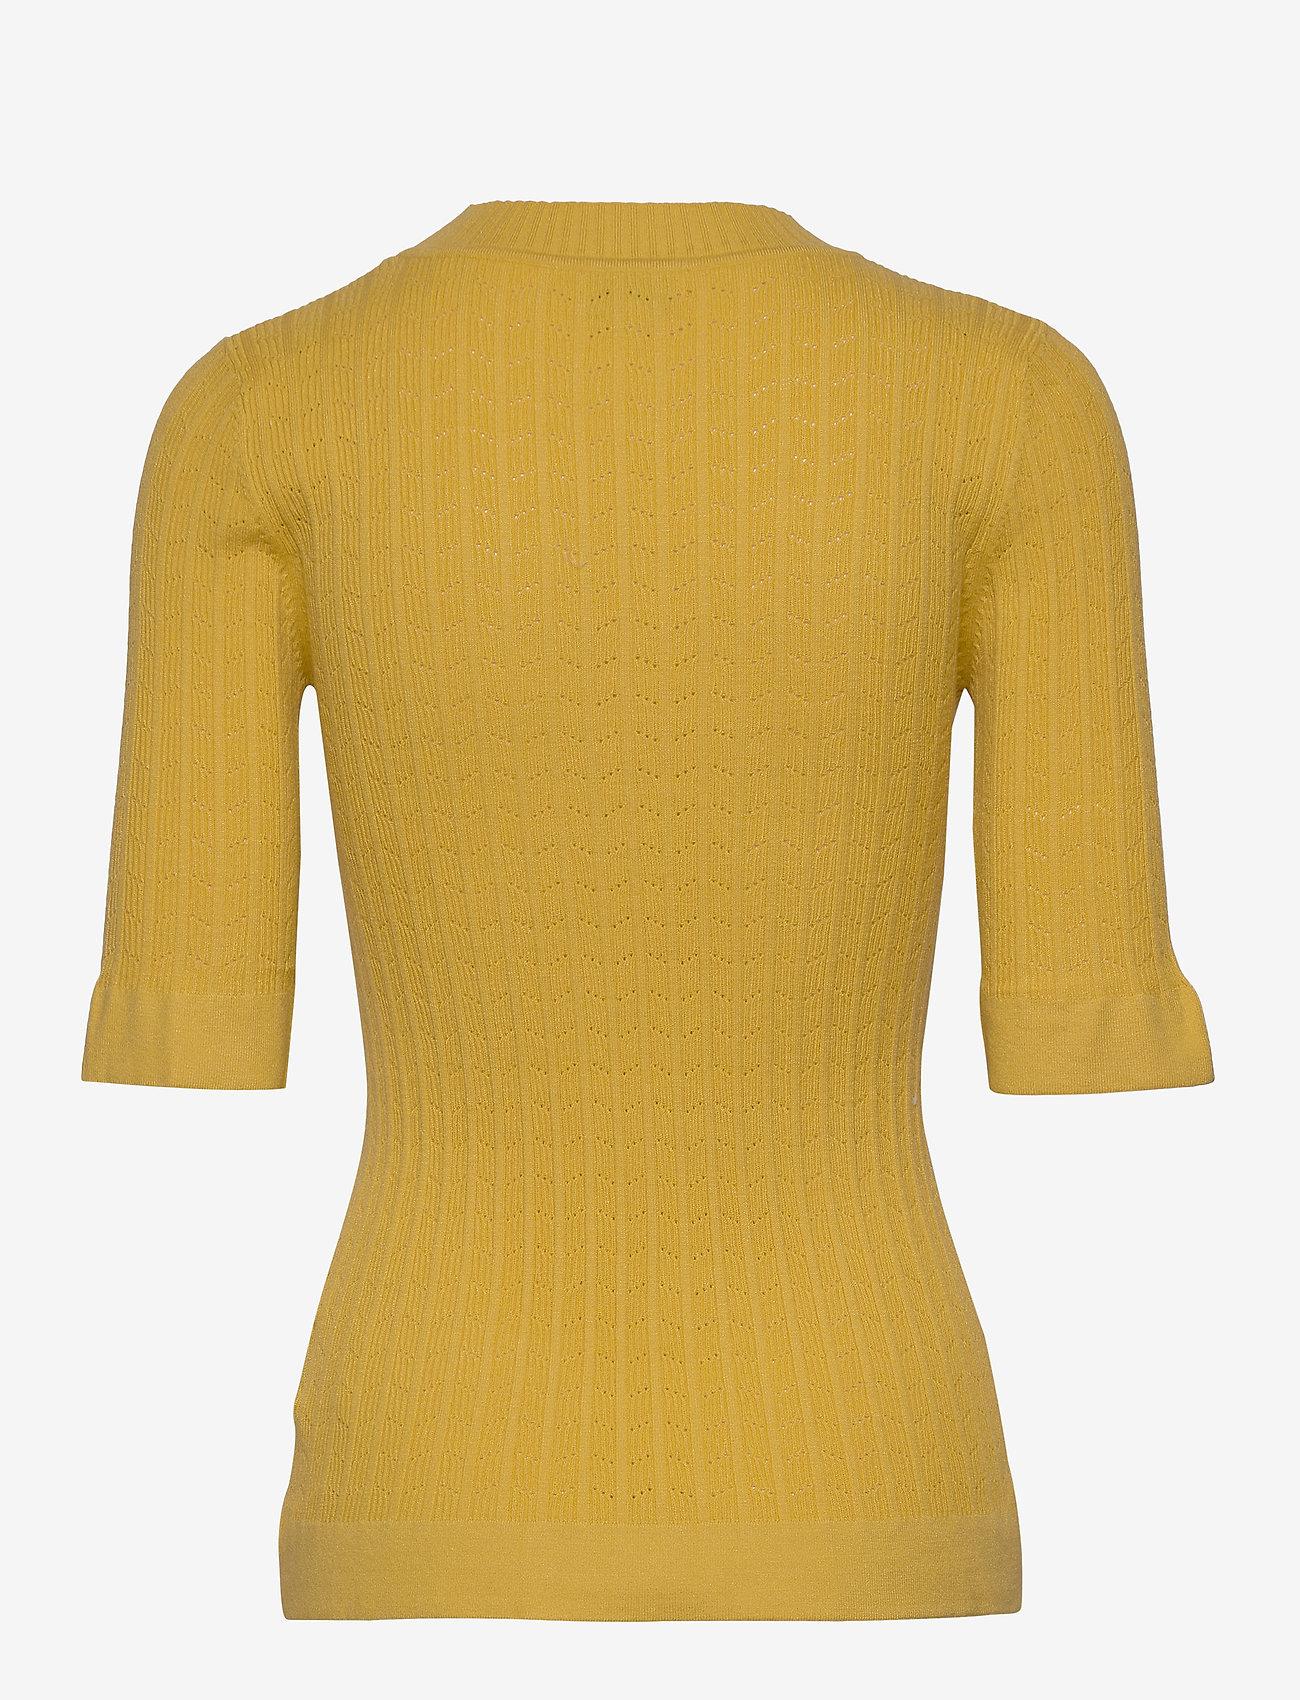 Noa Noa Pullover - T-shirty i zopy BAMBOO - Kobiety Odzież.